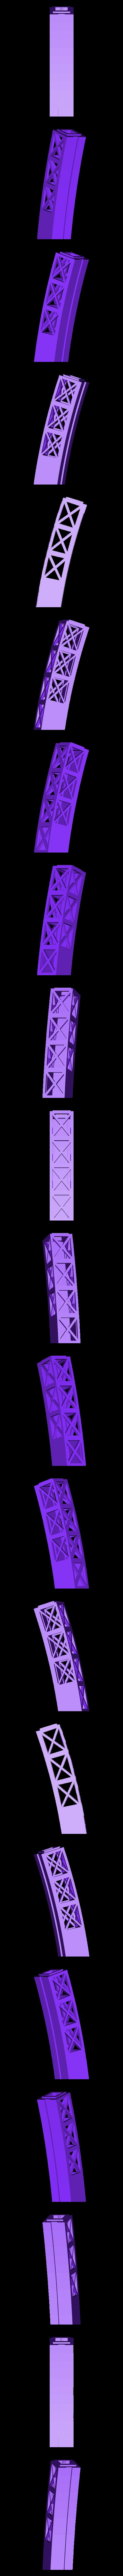 SEG_E-1.stl Download free STL file LED bridge lamp • Model to 3D print, Opossums